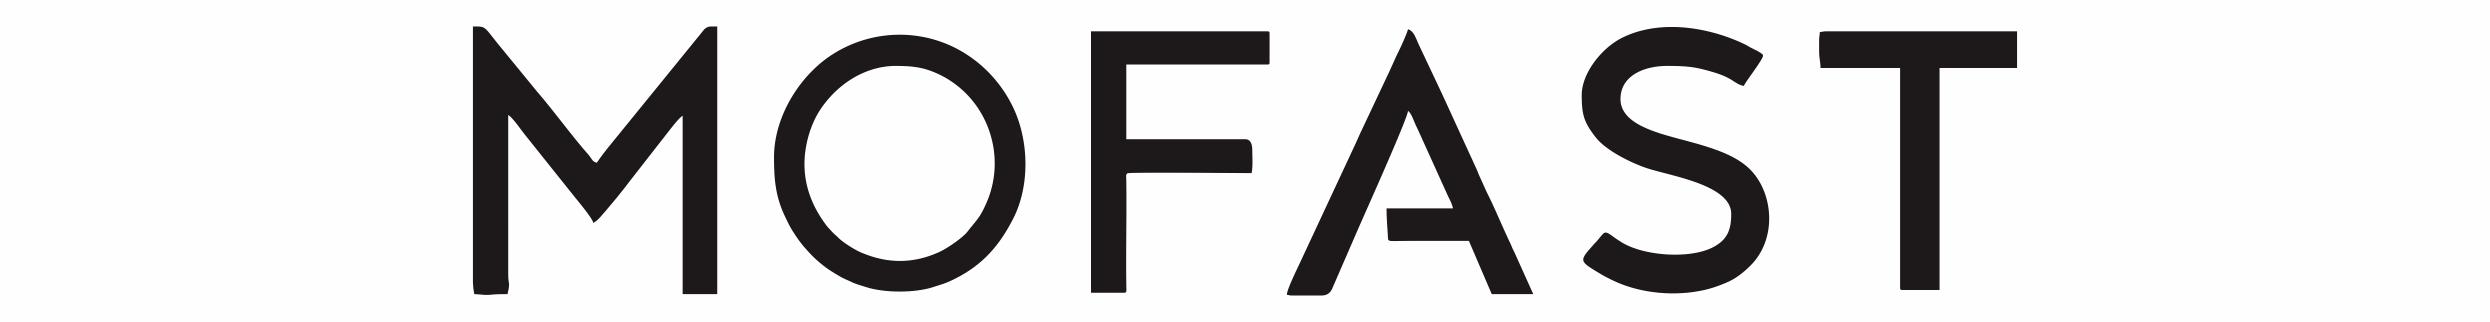 MOFAST INDONESIA logo